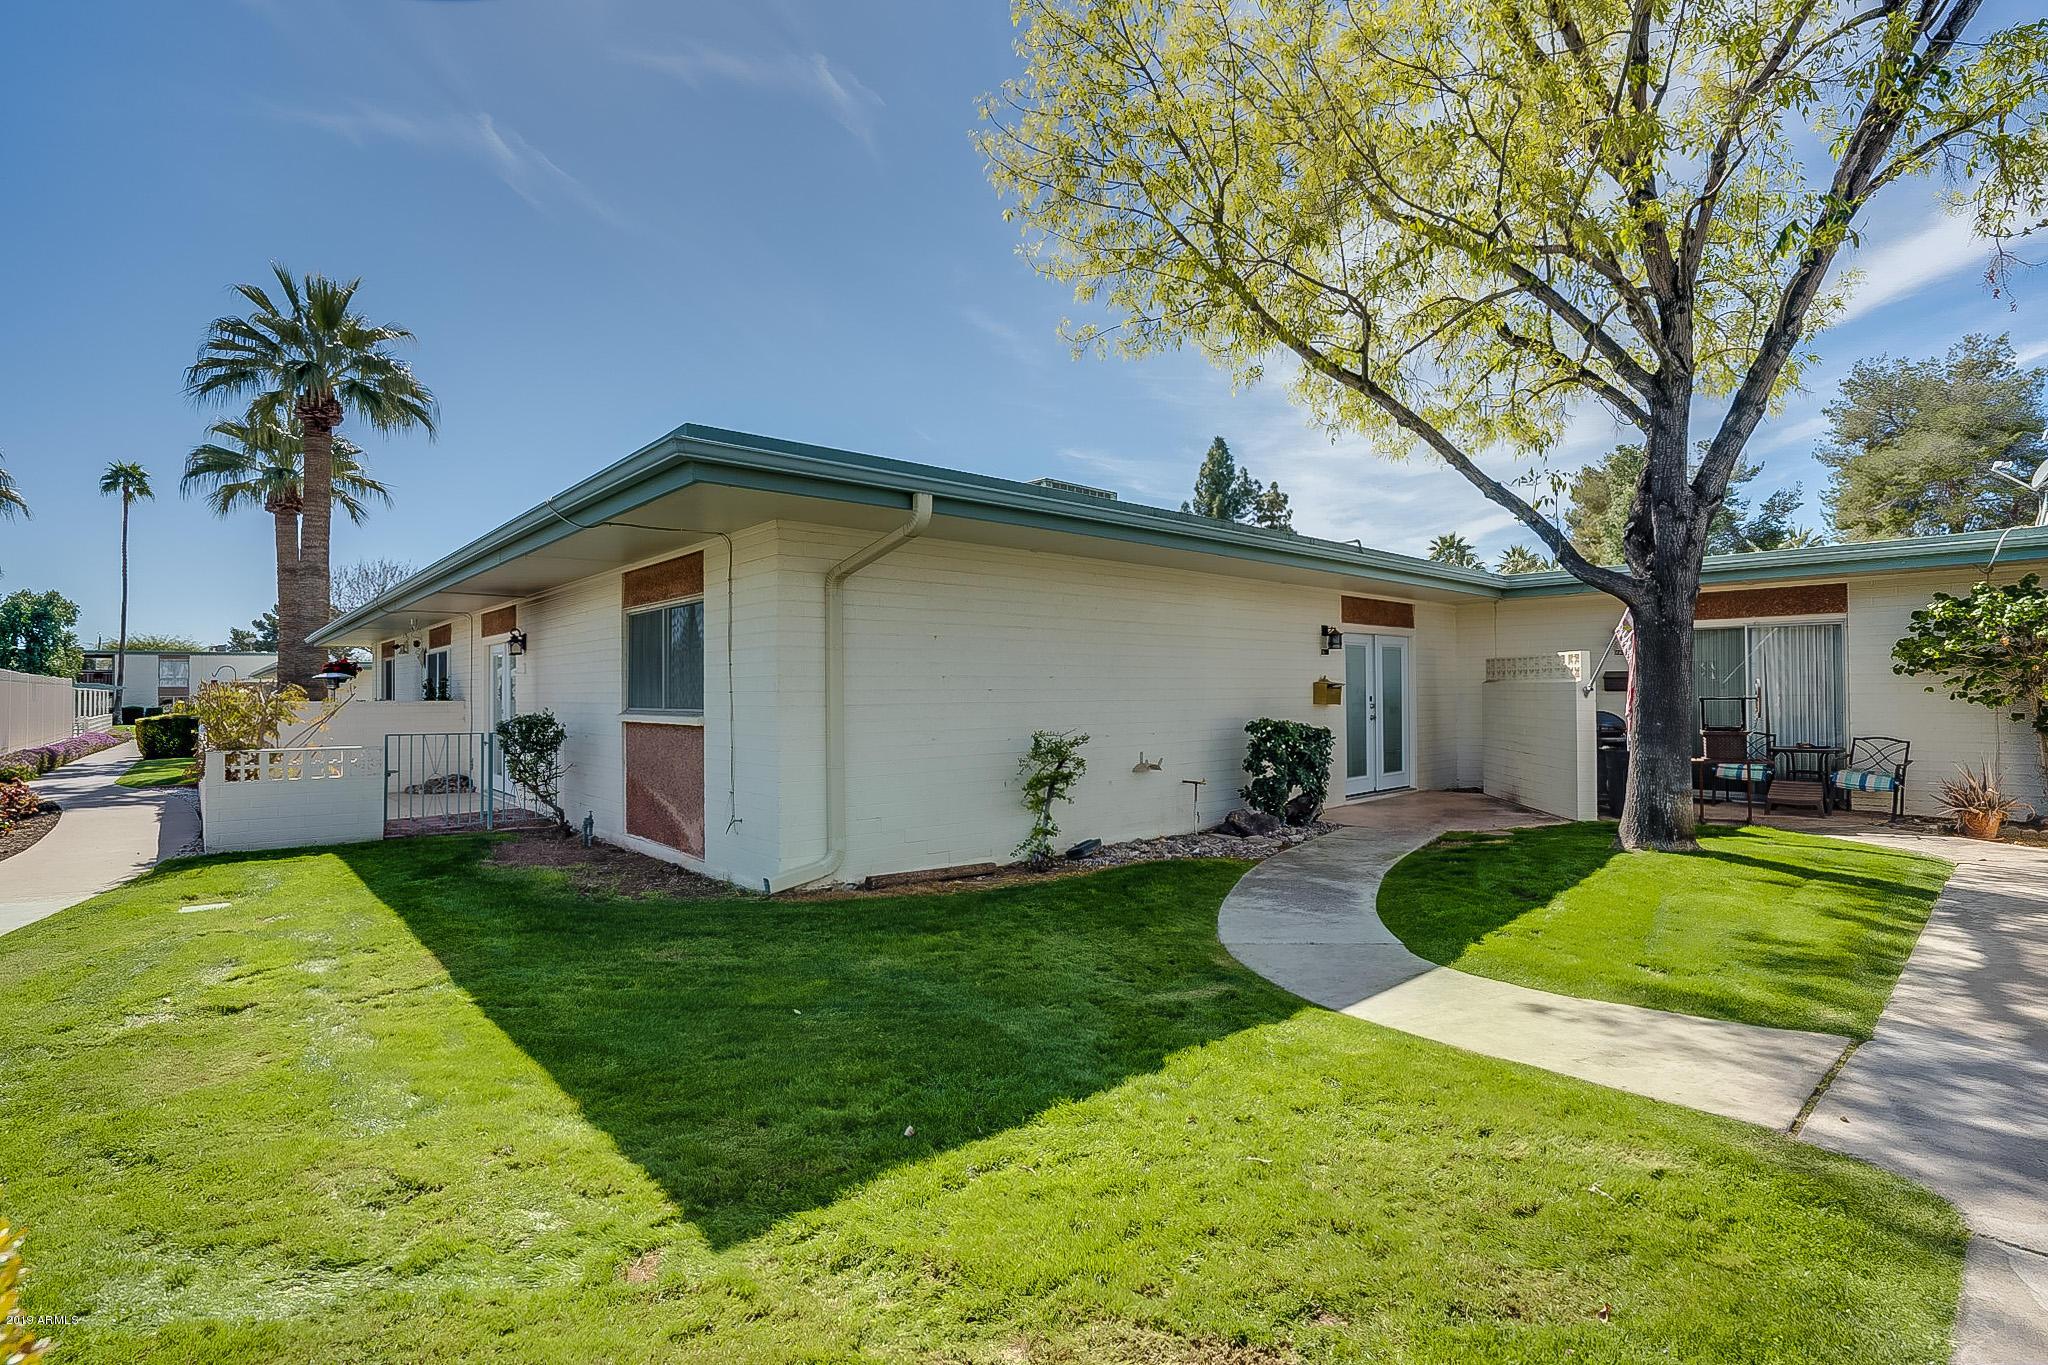 Photo of 1239 E MARYLAND Avenue #B, Phoenix, AZ 85014